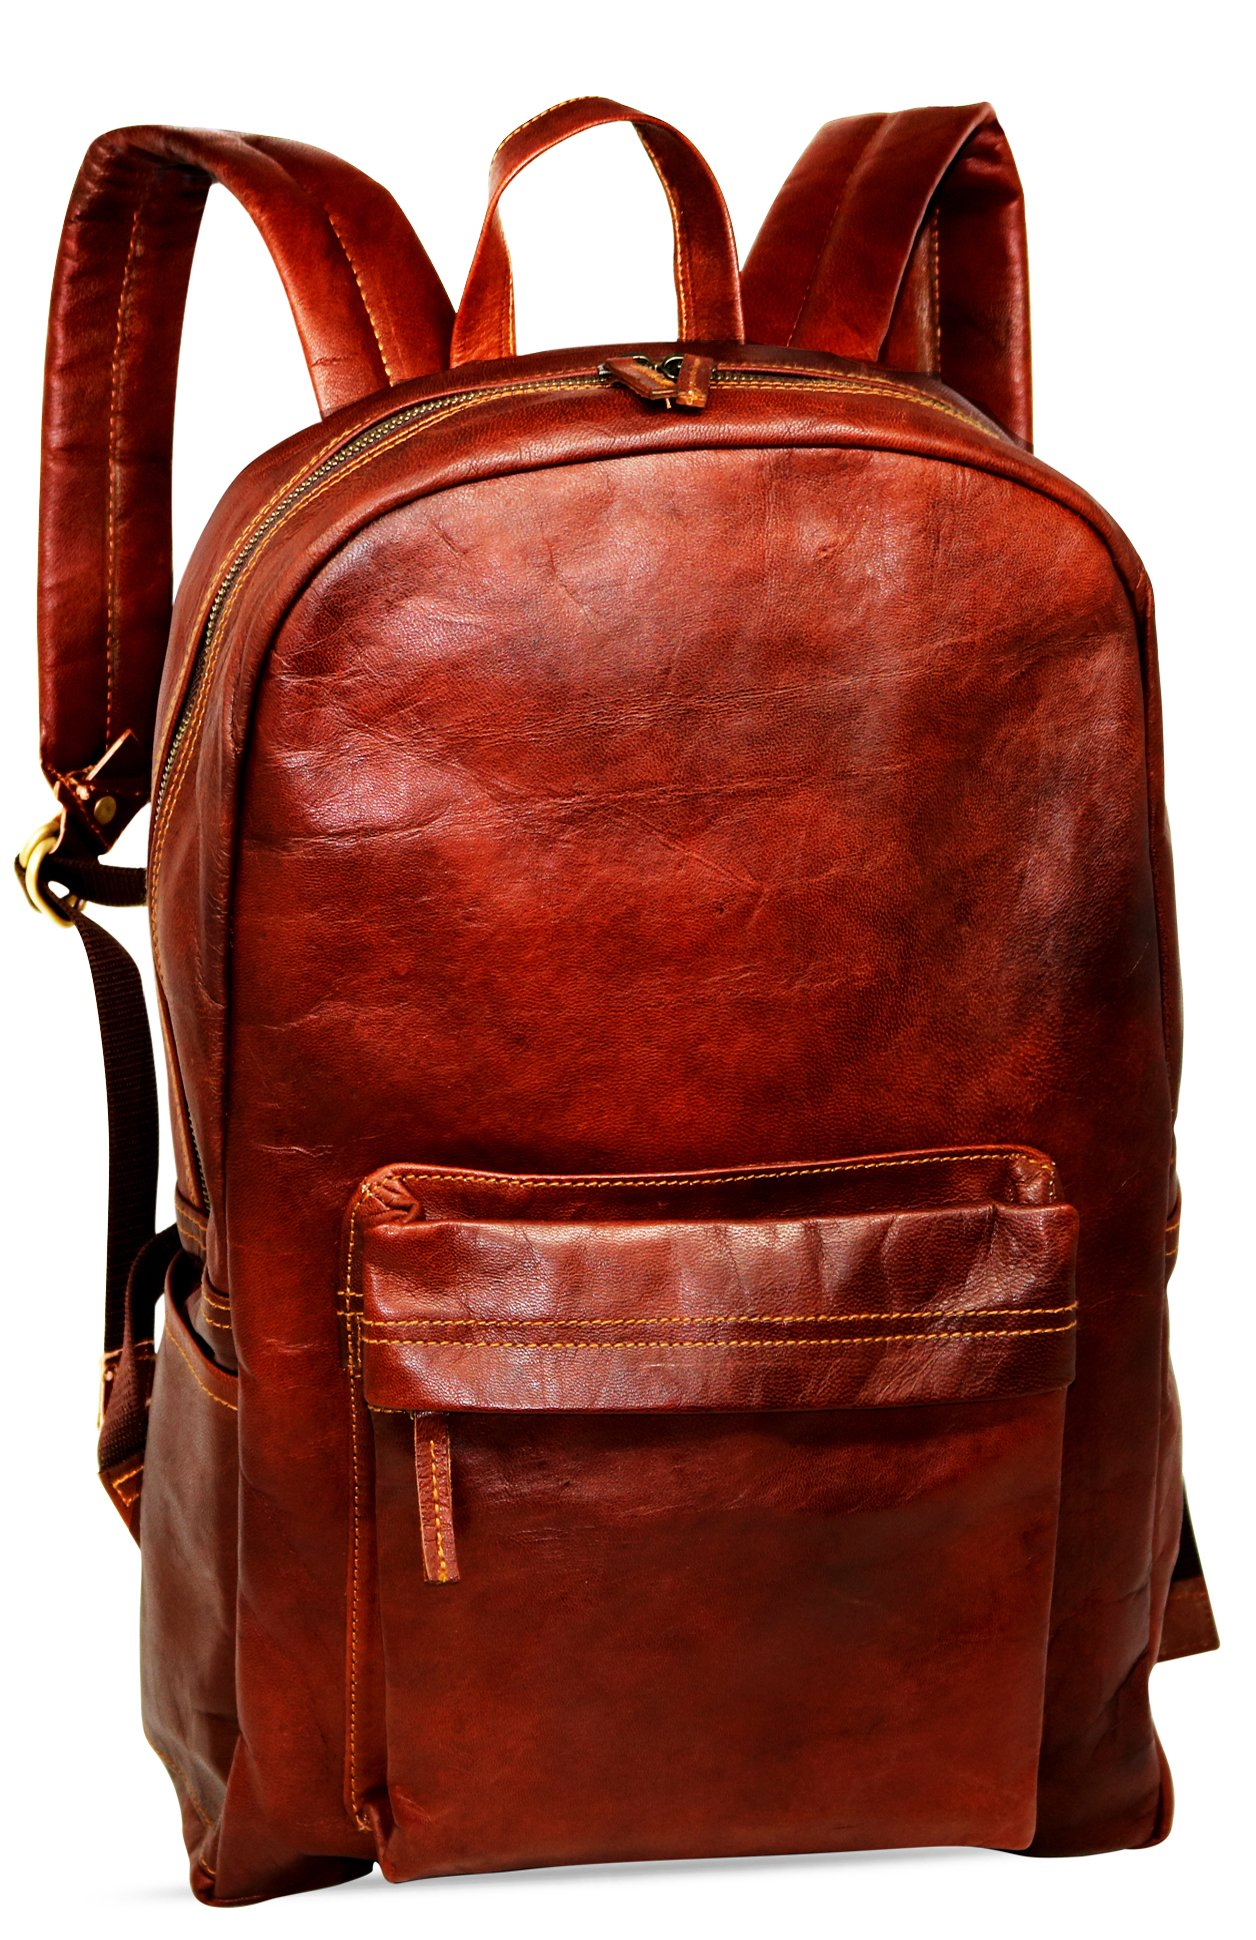 jaald 18'' Brown Leather Backpack Vintage Rucksack Laptop Bag Water Resistant Casual Daypack College Bookbag Comfortable Lightweight Travel Backpack Hiking/Picnic Bag for Men by jaald